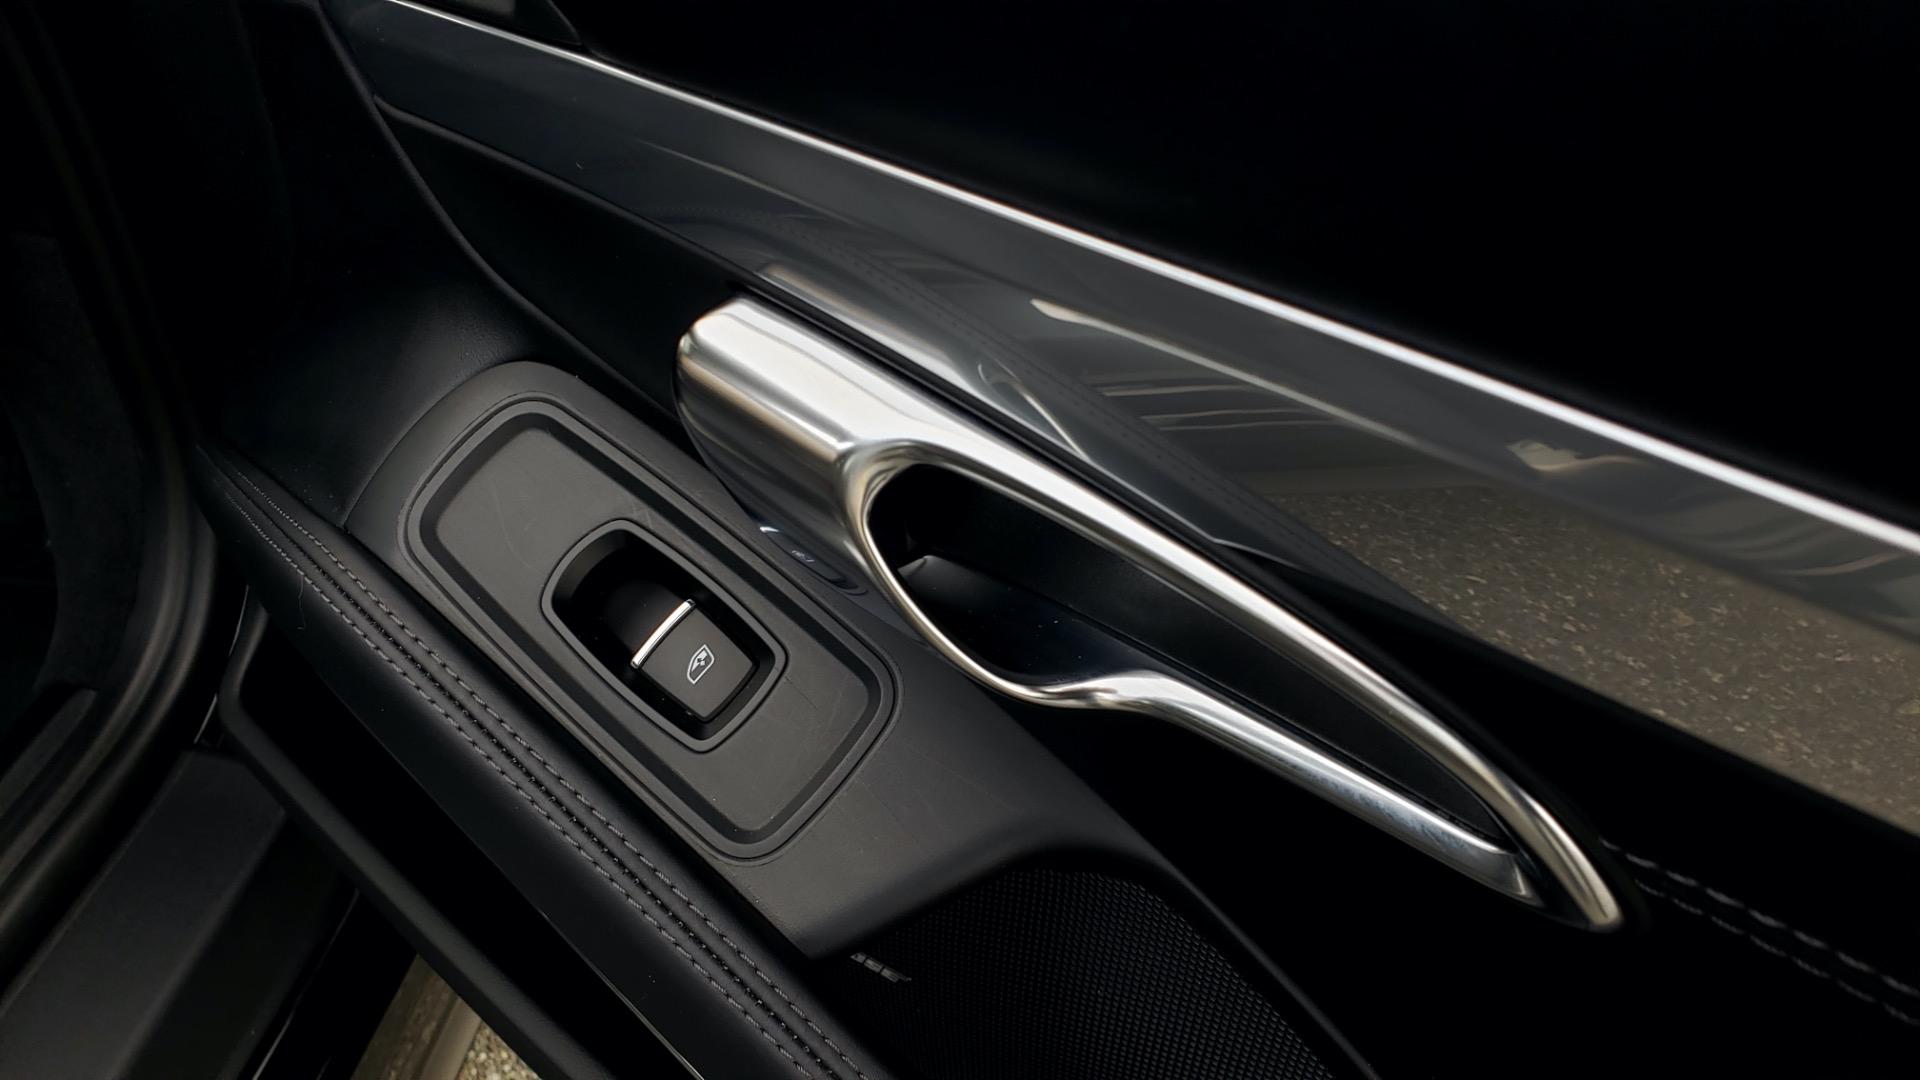 Used 2014 Porsche 911 CARRERA 4S / PREM PKG PLUS / NAV / SUNROO / BOSE / CHRONO for sale Sold at Formula Imports in Charlotte NC 28227 66